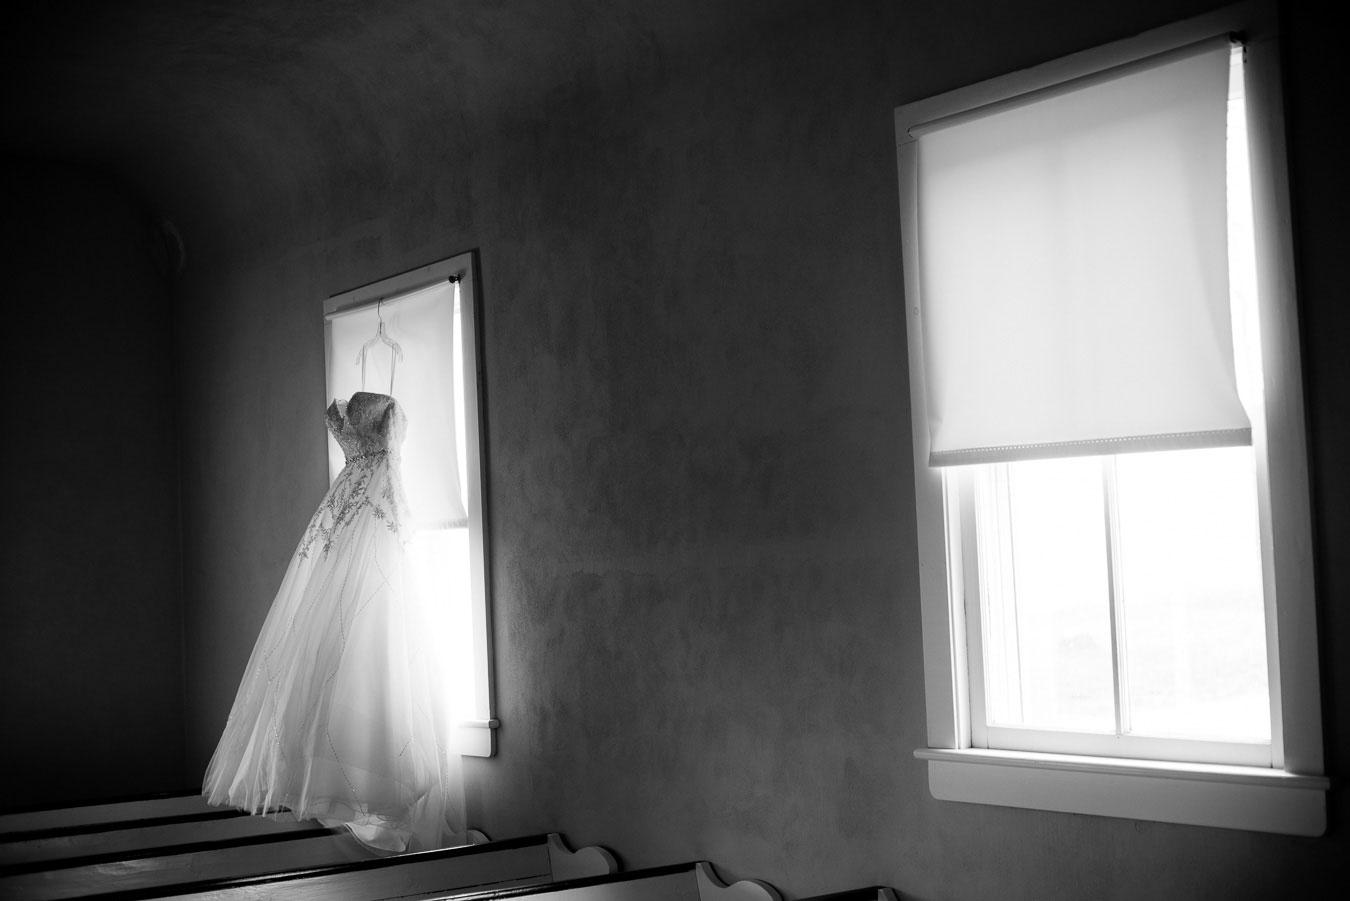 Williamsport-weddings-Photographer.jpg